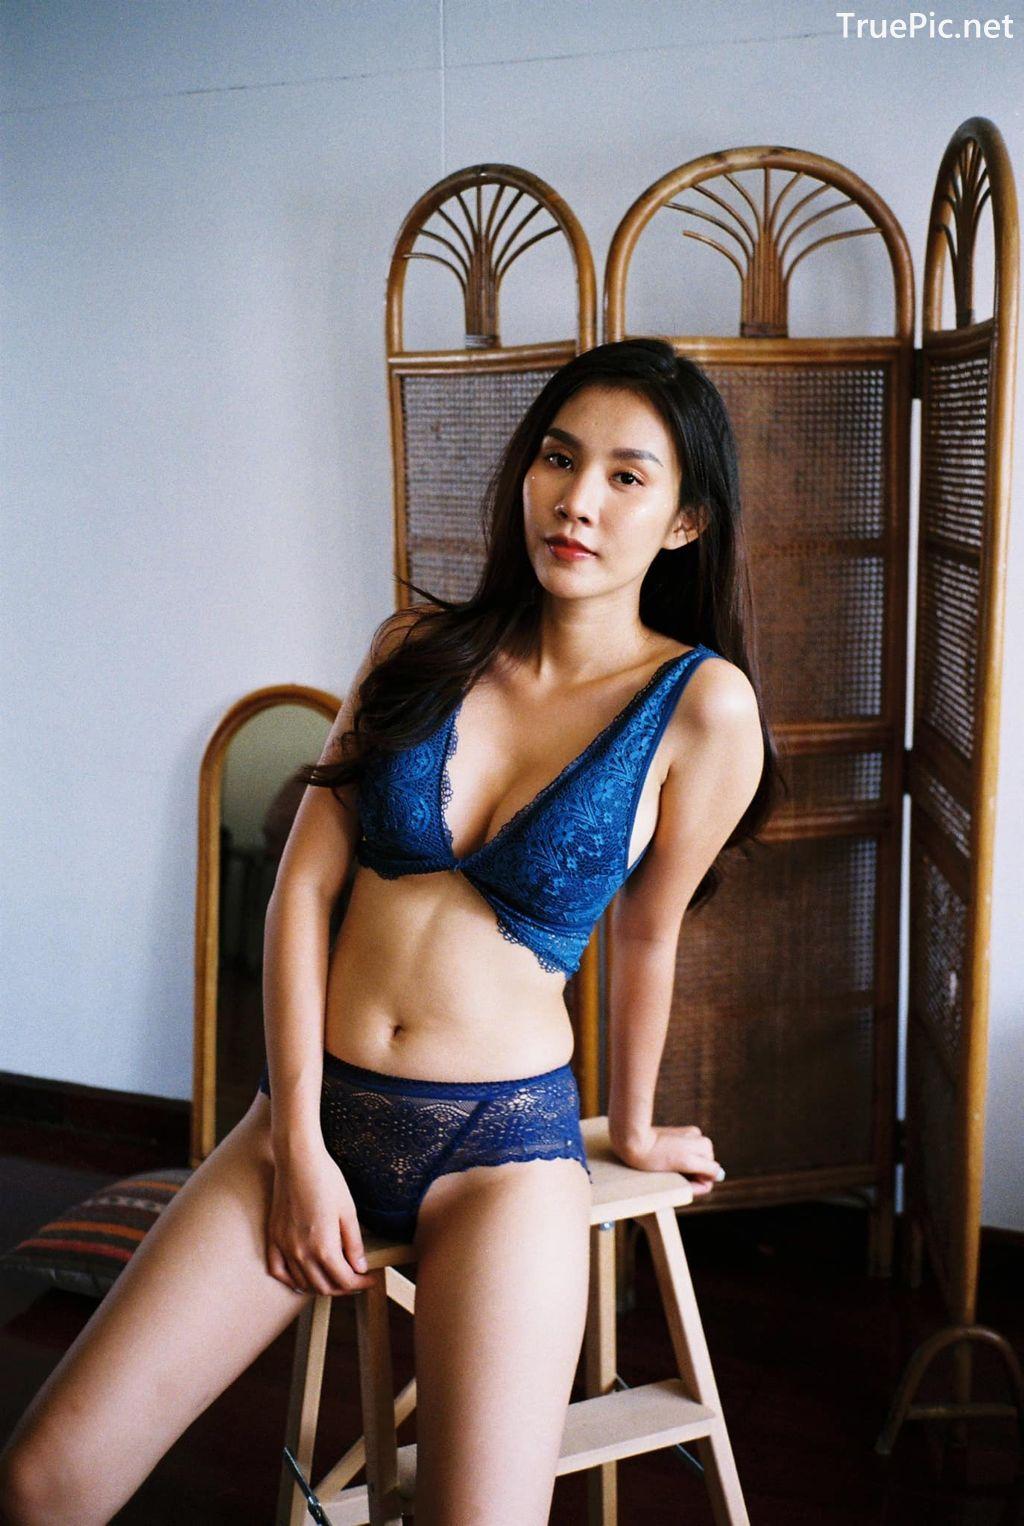 Image-Thailand-Model-Ssomch-Tanass-Blue-Lingerie-TruePic.net-TruePic.net- Picture-24